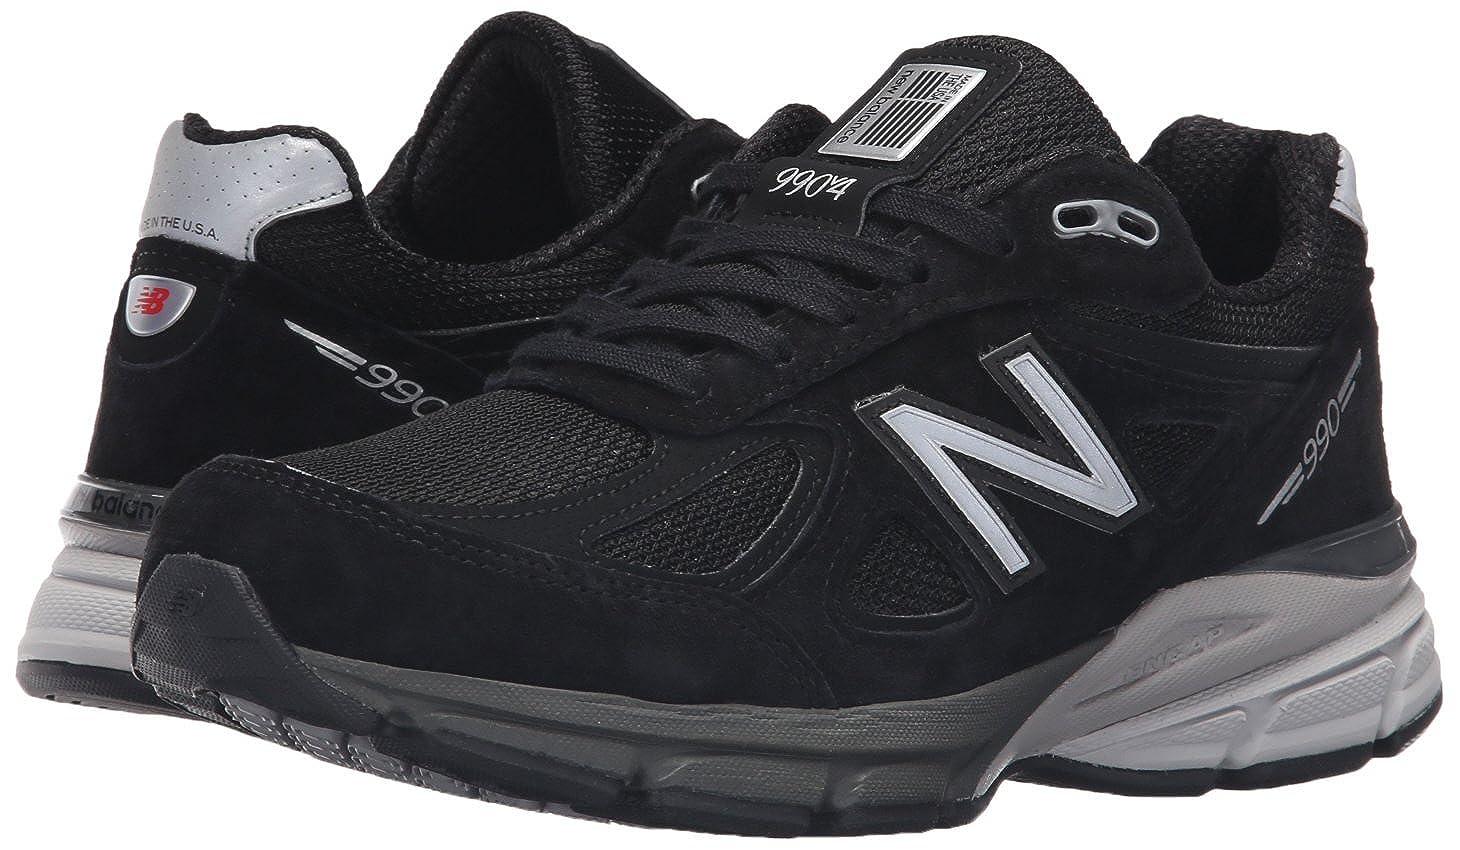 New Balance Damen W990v4 Laufschuh-w schwarz schwarz schwarz Silber 39.5 EU W 24d257